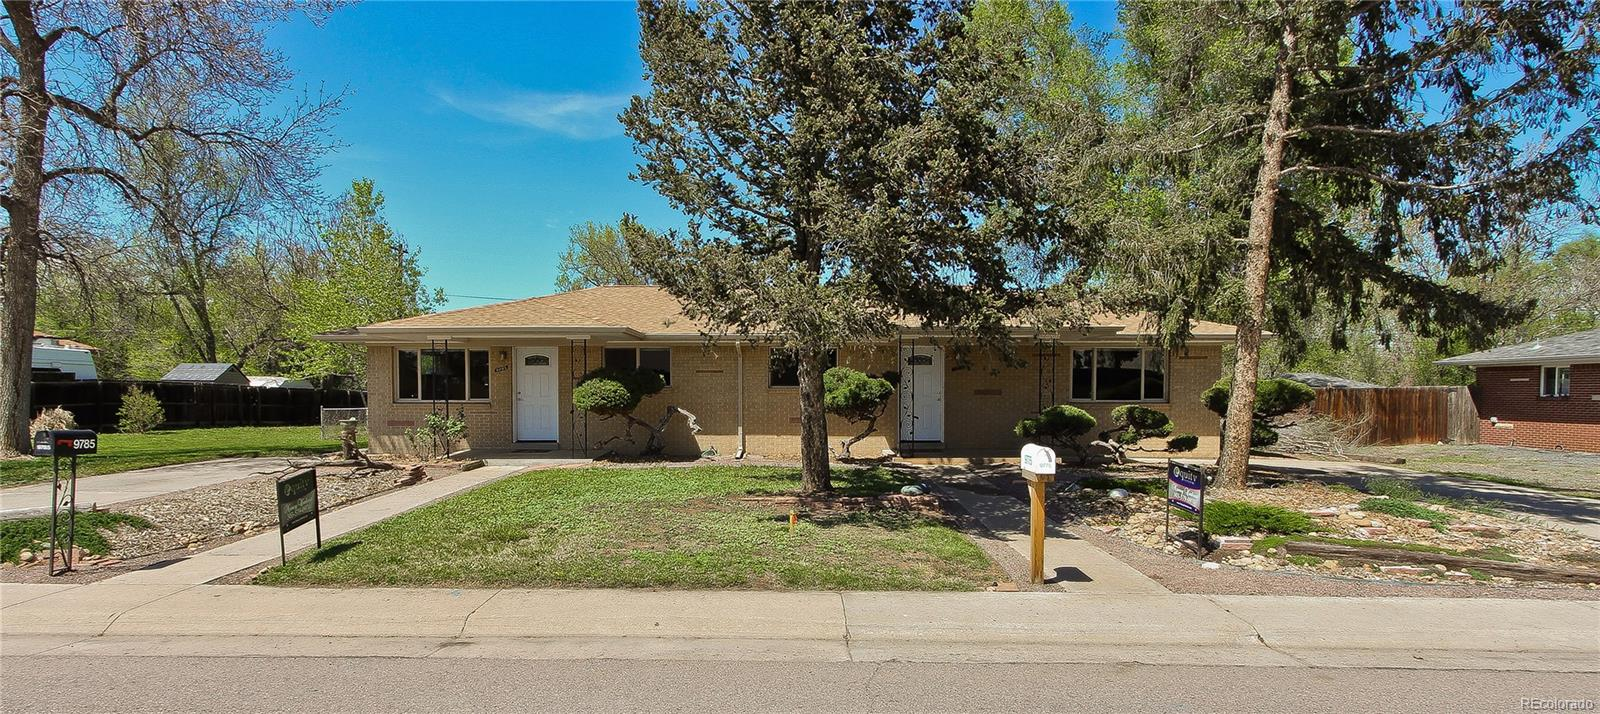 9775 41 ST, Wheat Ridge, CO 80033 - Wheat Ridge, CO real estate listing